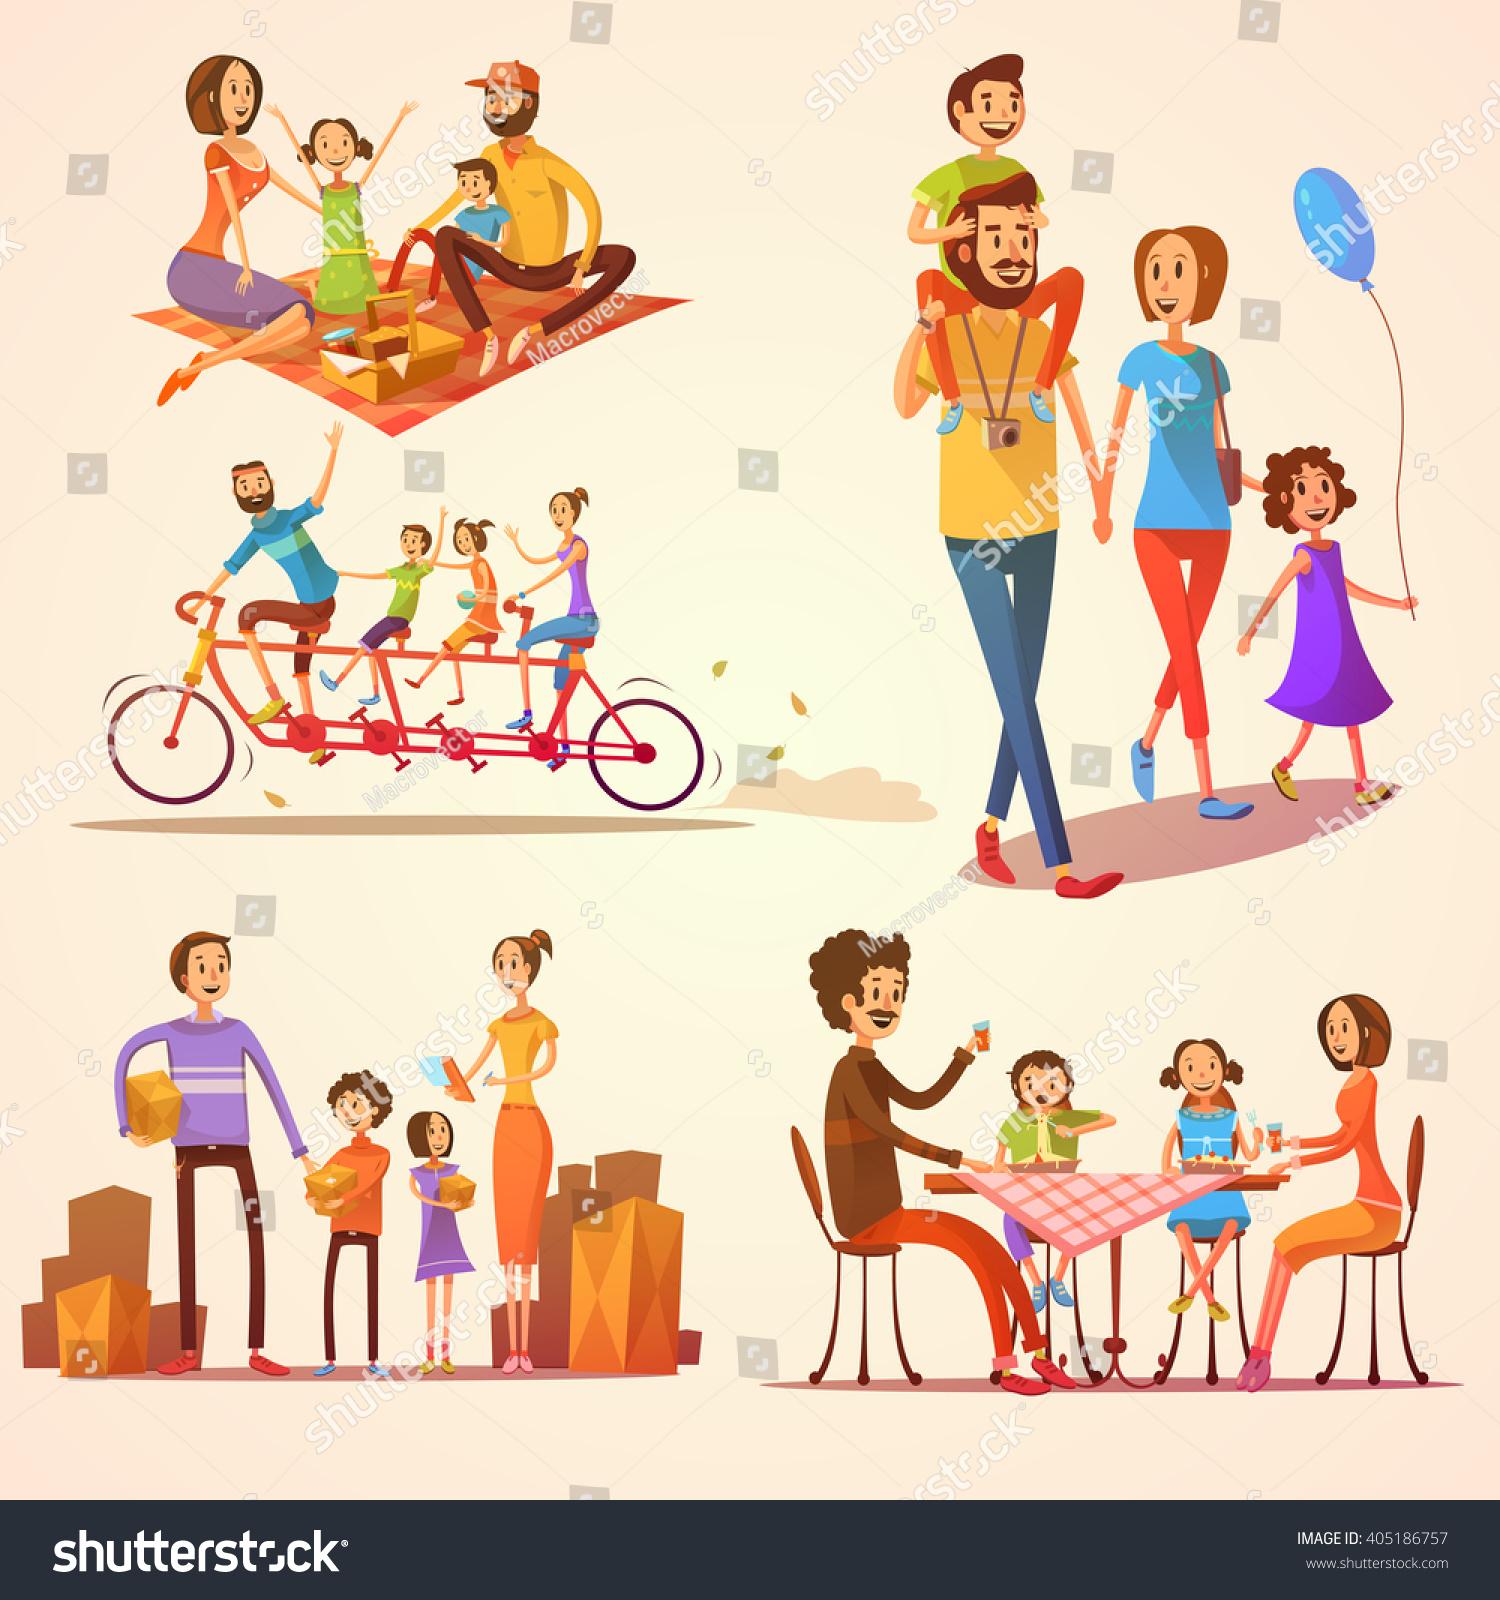 Family Activities: Family Retro Cartoon Set With Celebrations Holidays And